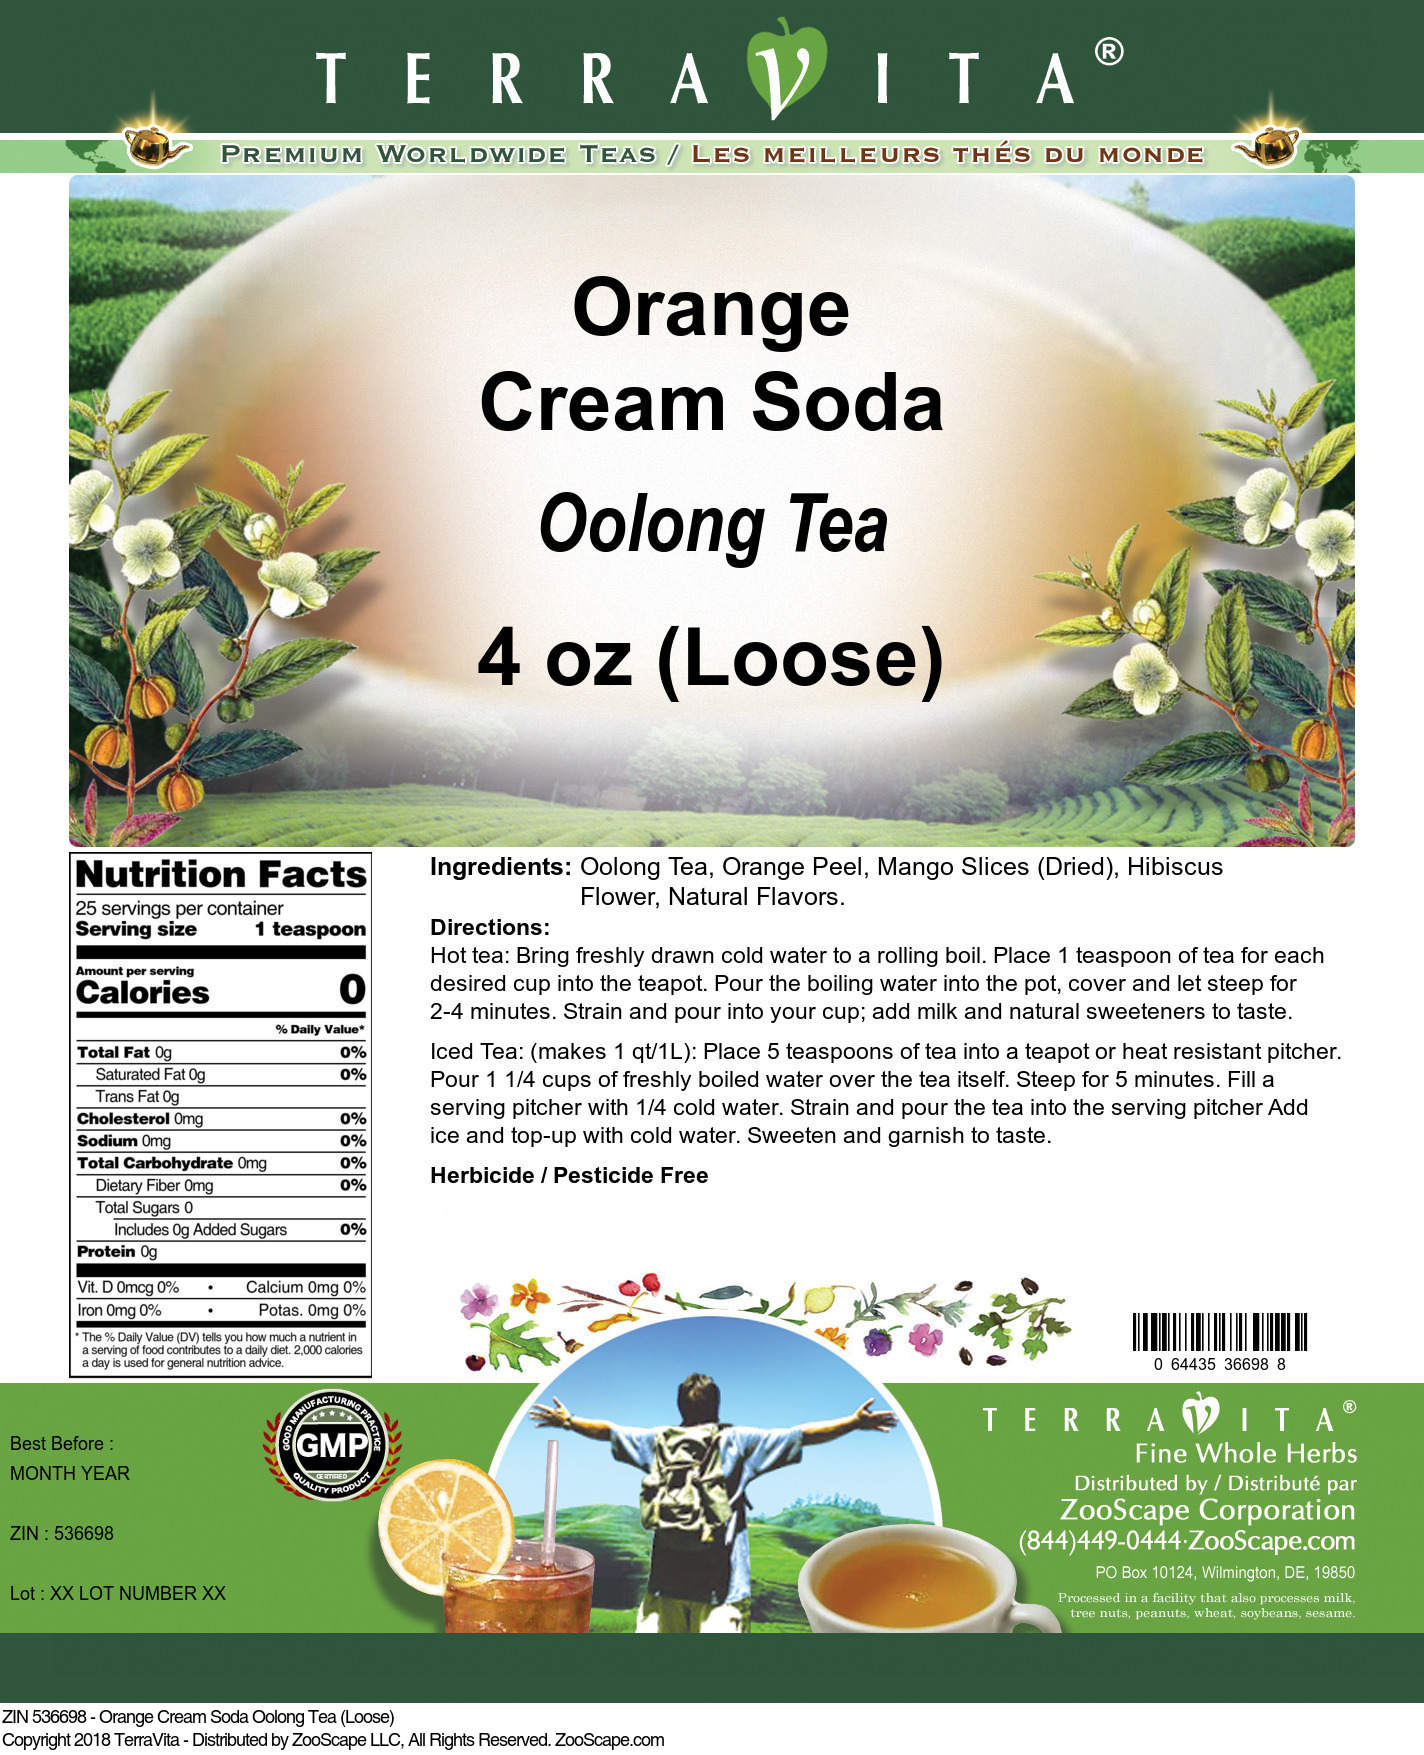 Orange Cream Soda Oolong Tea (Loose)